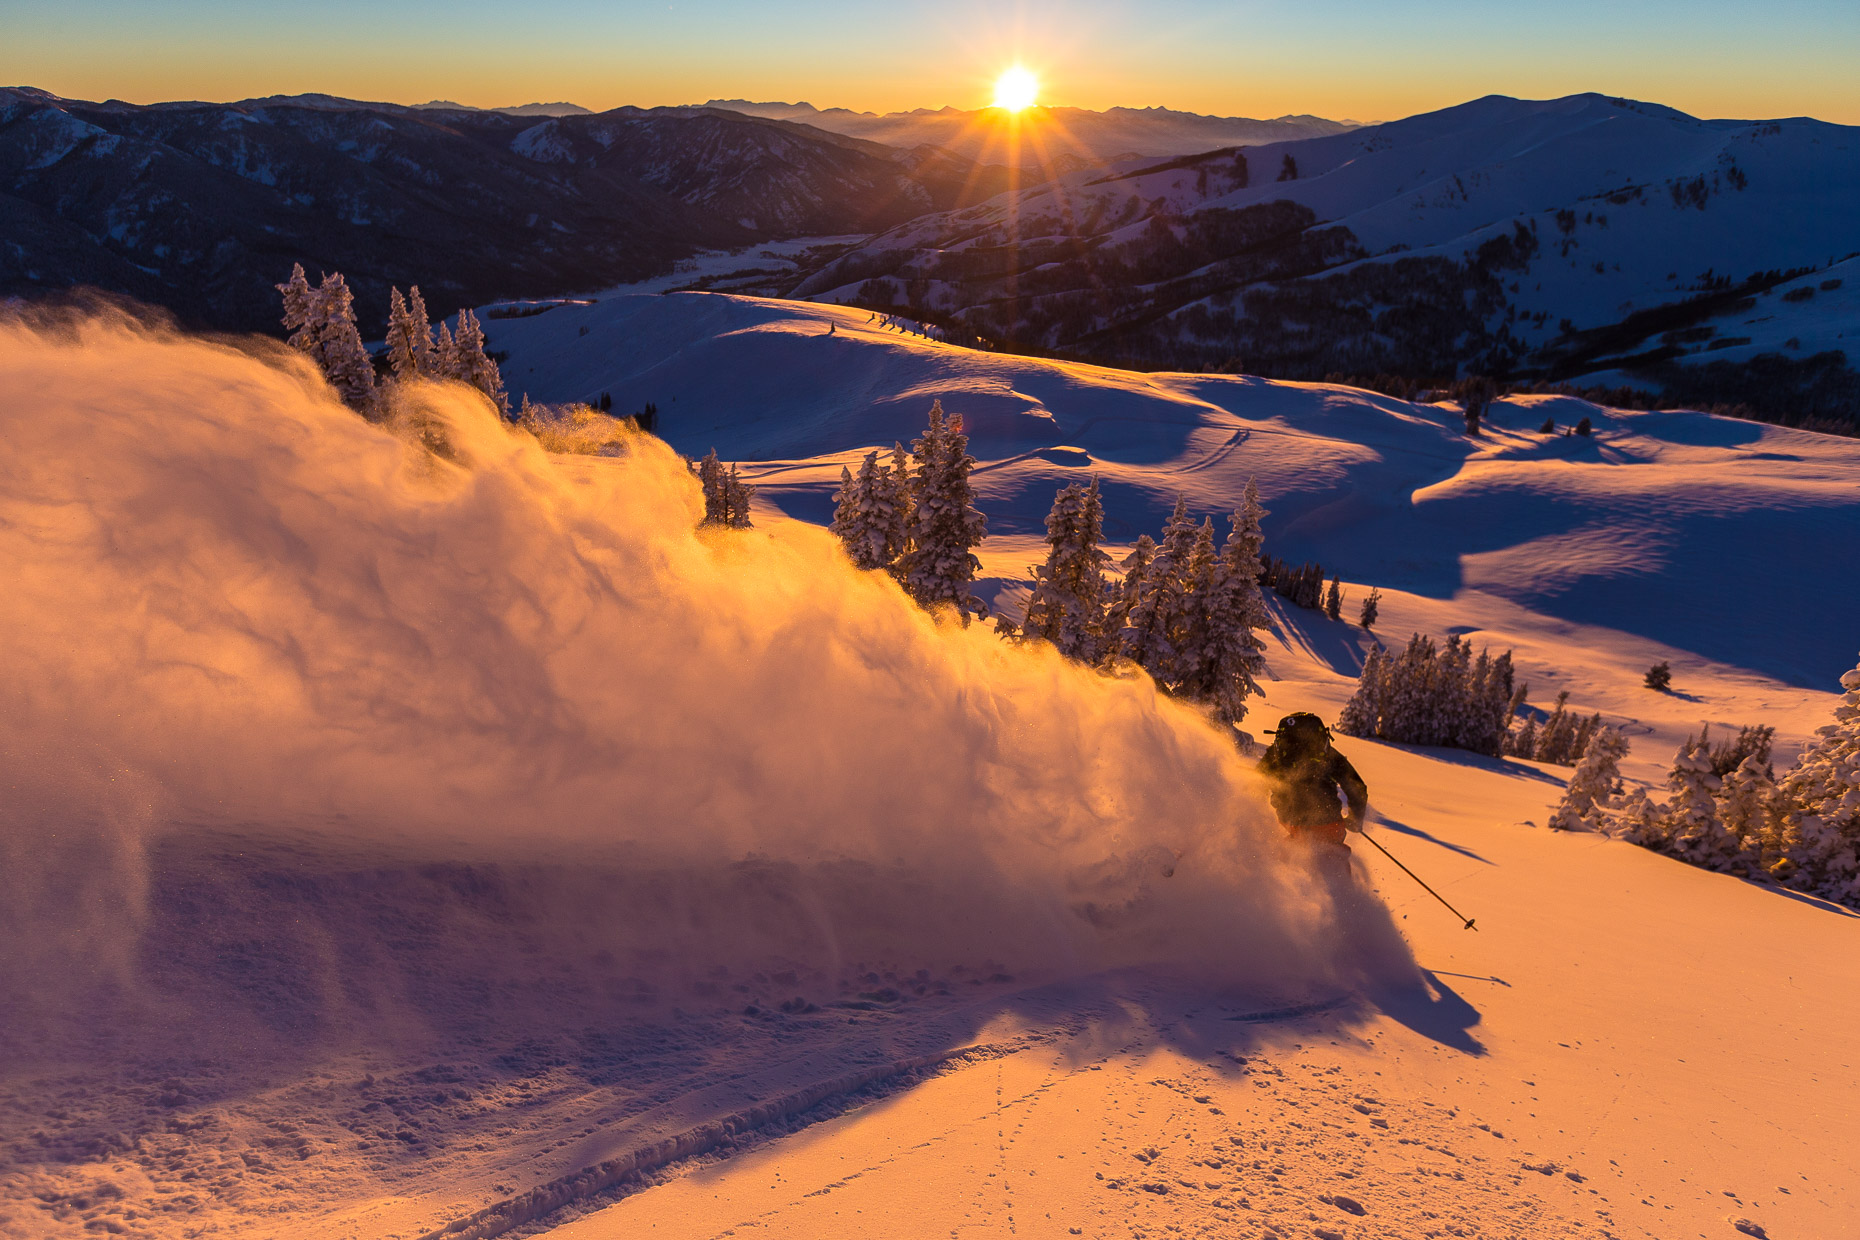 Dane Tudor Shredding at Park City Utah Photo: grantgunderson